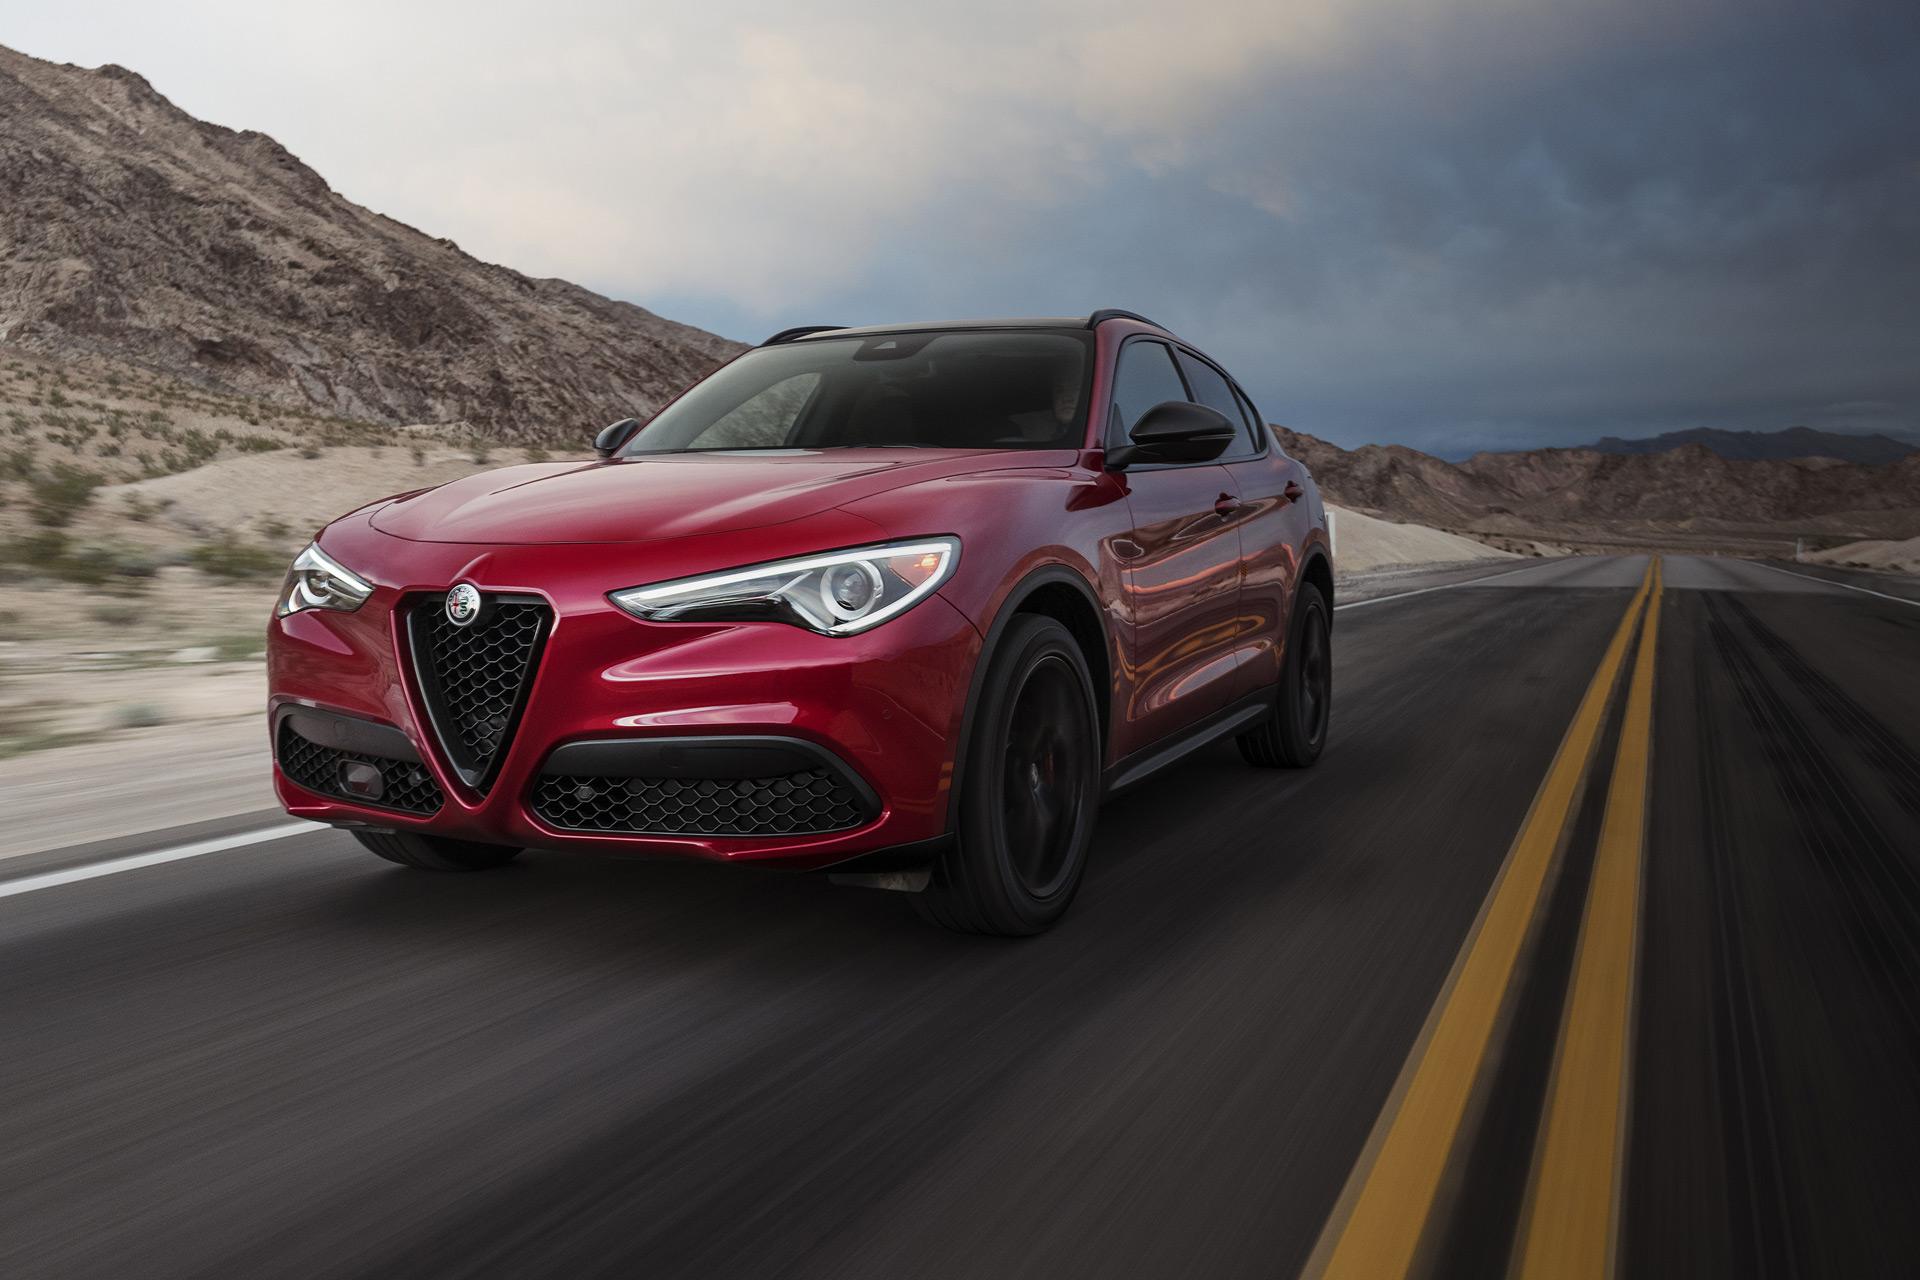 Alfa Romeo Announces 2019 Plans 4c Coupe Gone Hello Rwd Stelvio